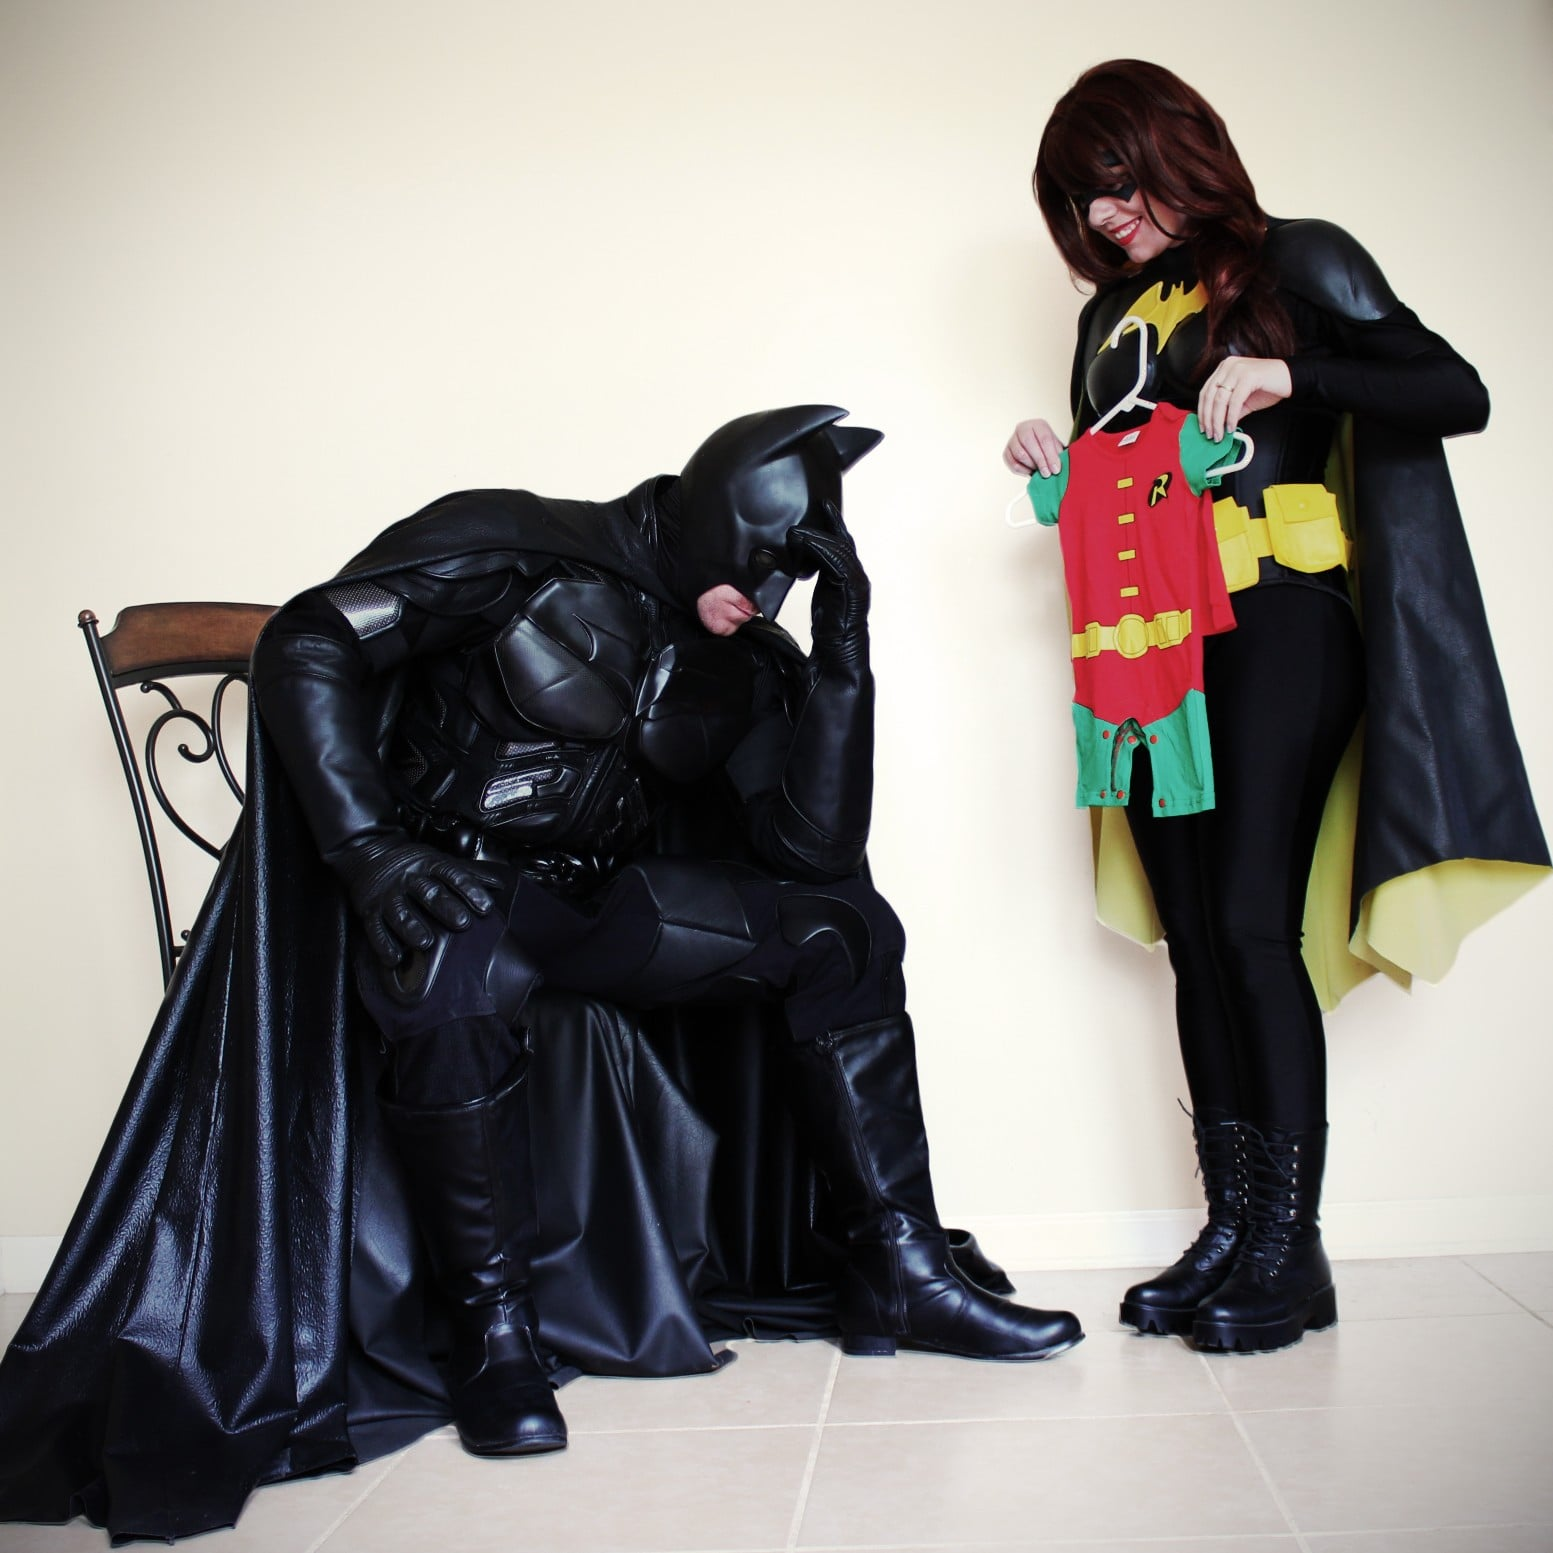 & Batman and Batgirl Sidekick Pregnancy Announcement | POPSUGAR Moms